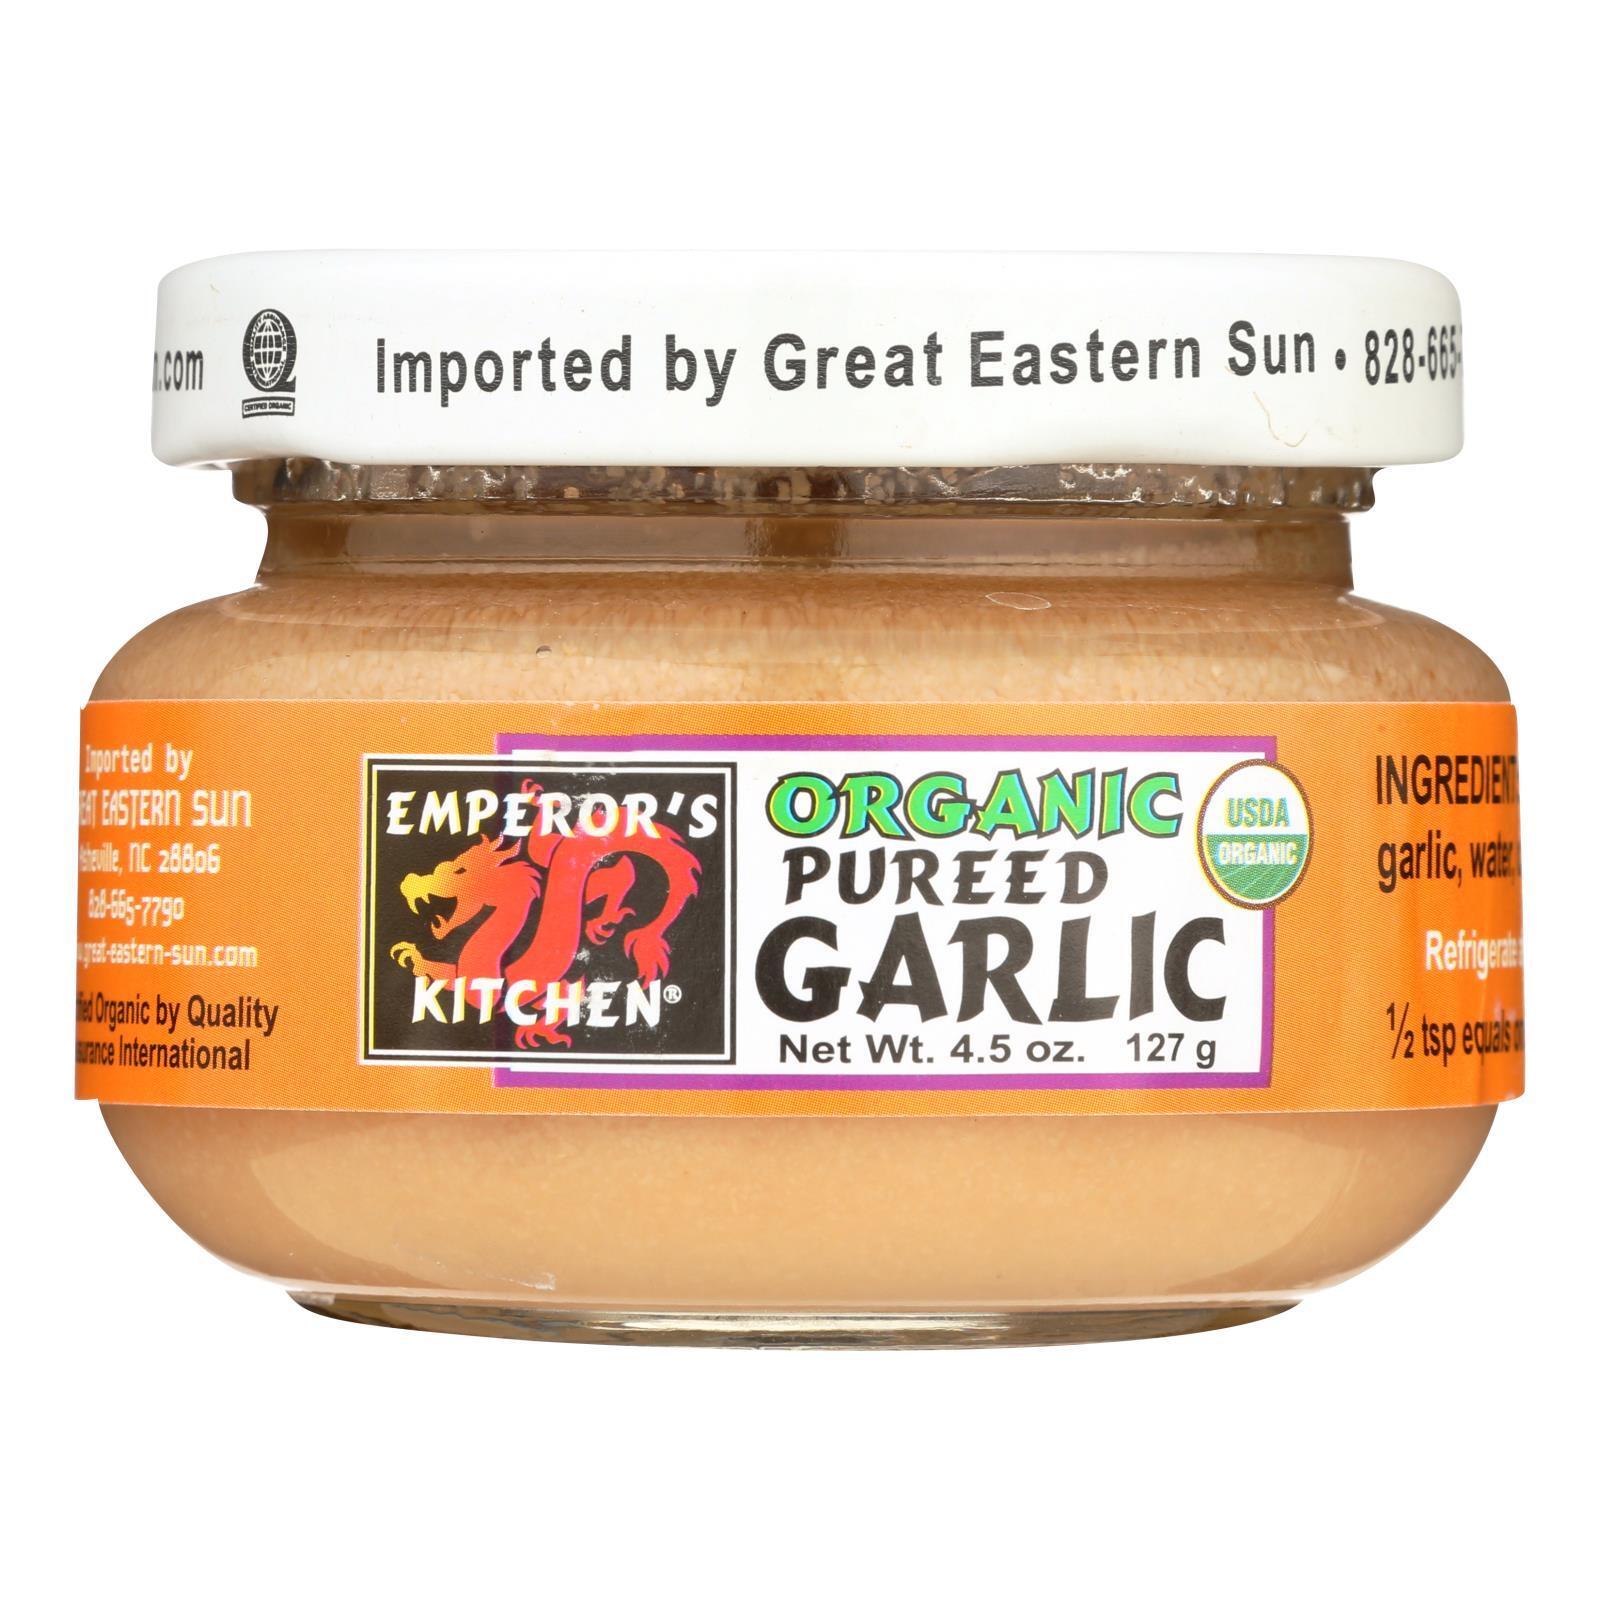 Emperor's Kitchen Organic Garlic - Pureed - Case of 12 - 4.5 oz.